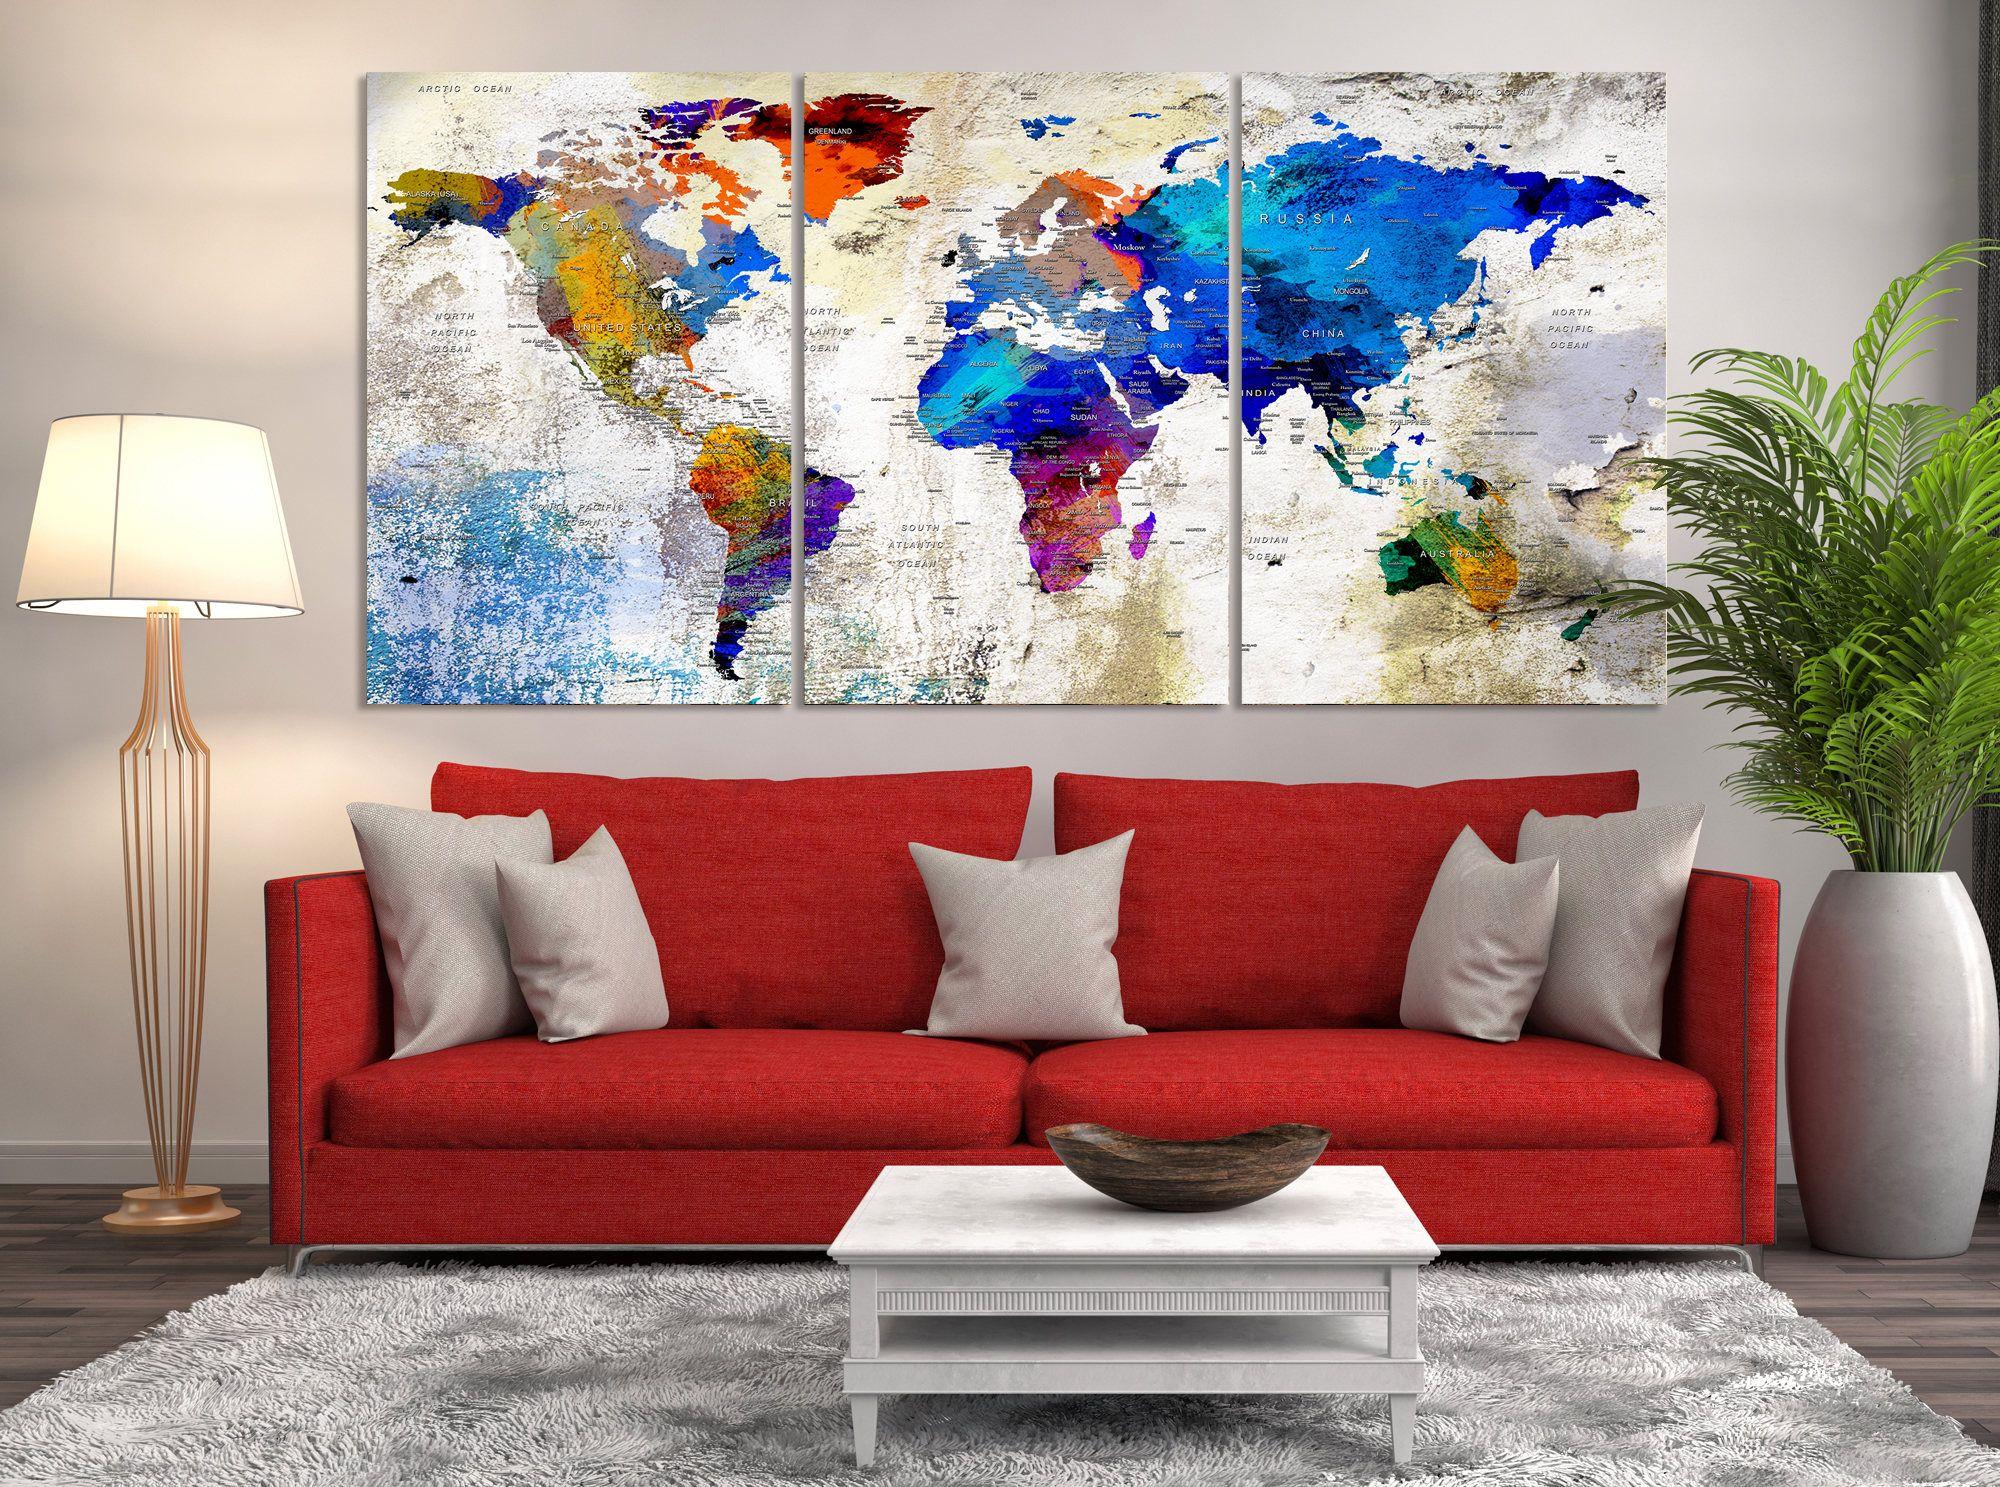 53868 large wall art push pin world map canvas print world map 53868 large wall art push pin world map canvas print world map wall gumiabroncs Gallery